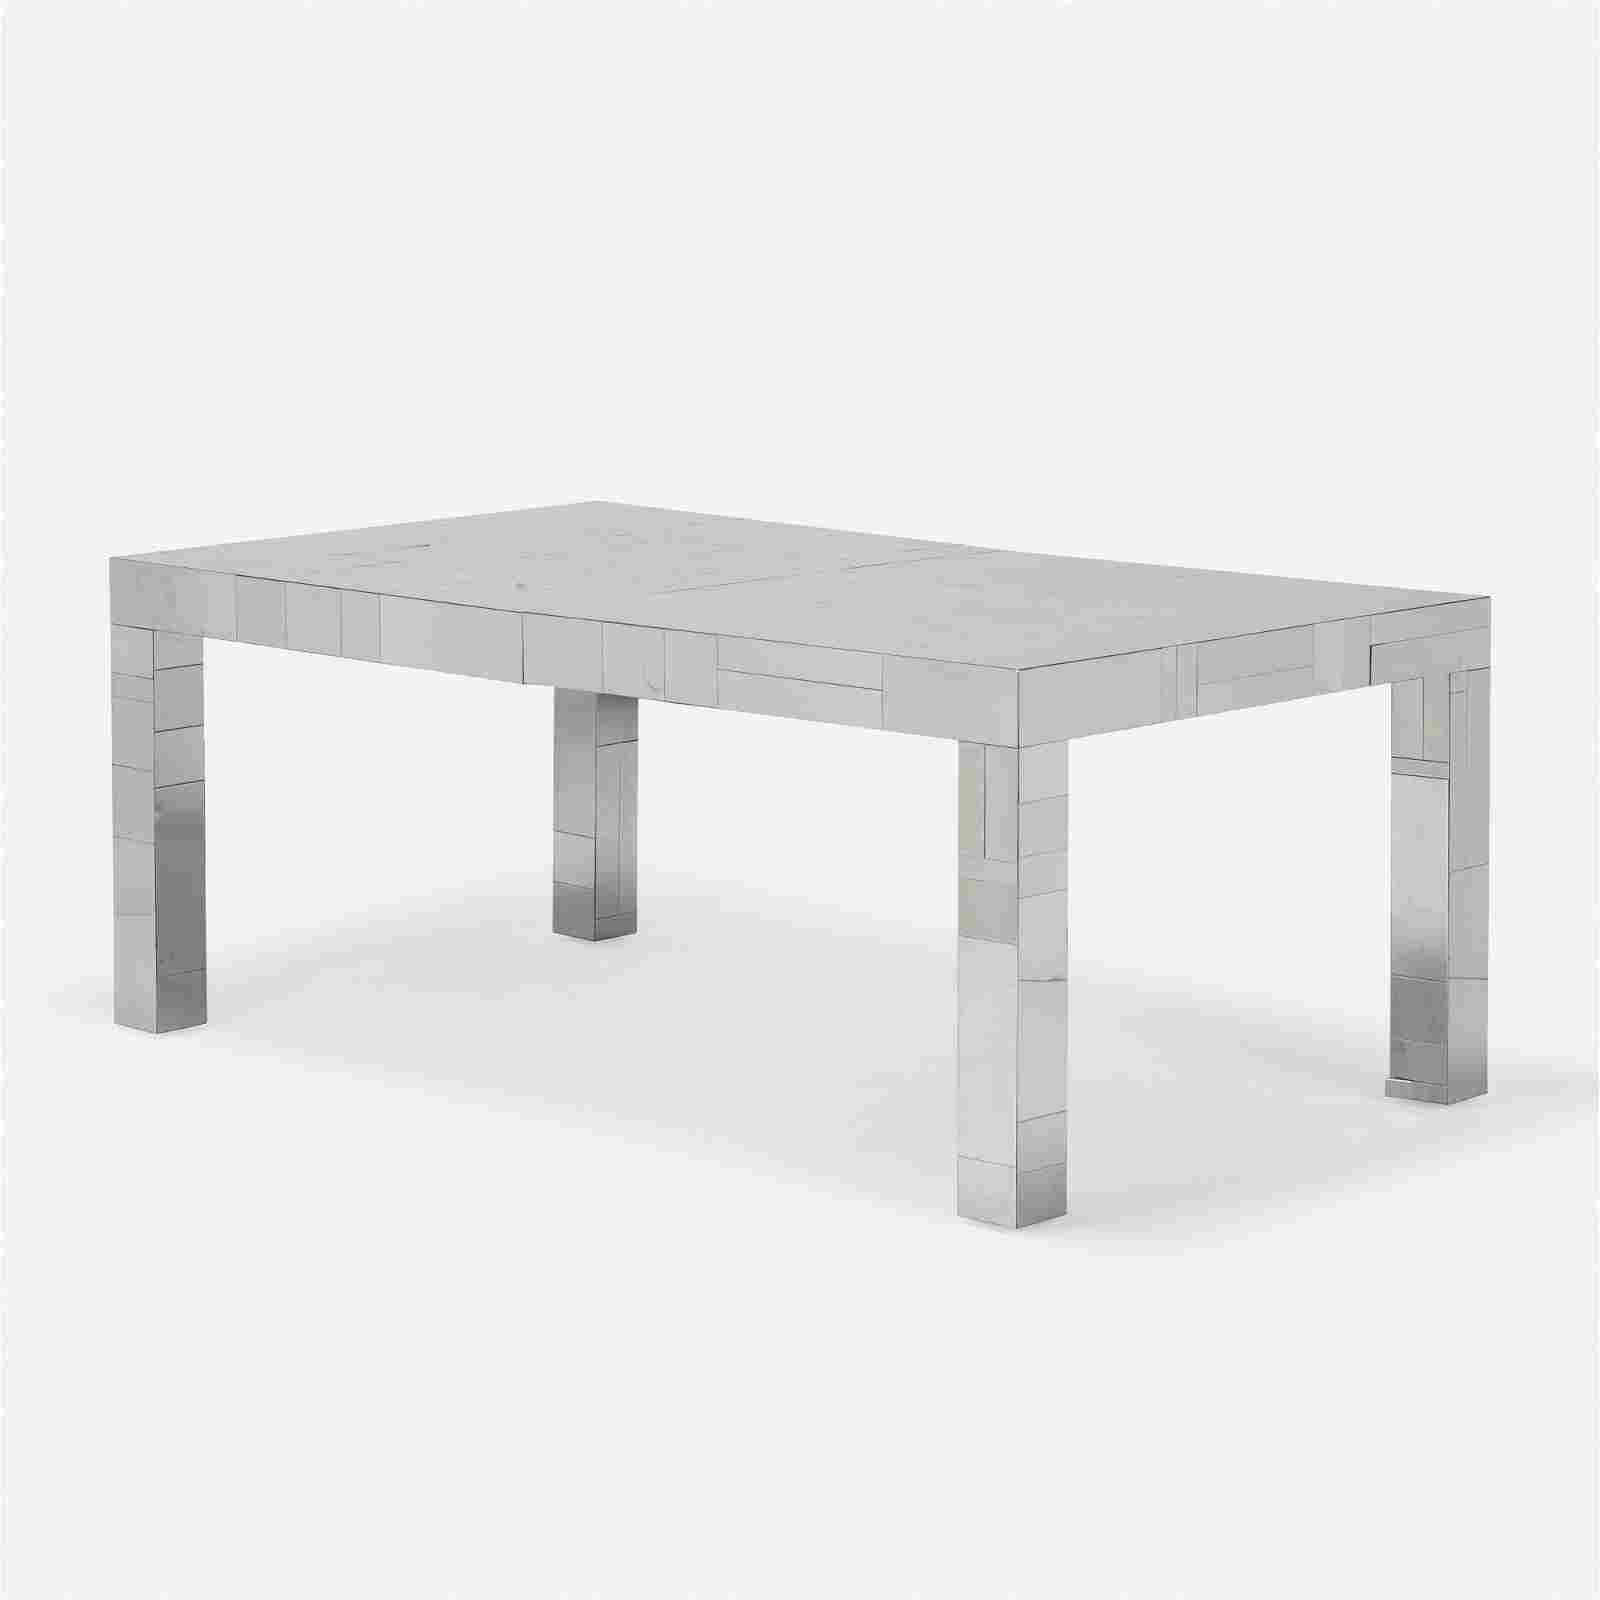 Paul Evans, Cityscape dining table, model PE 209